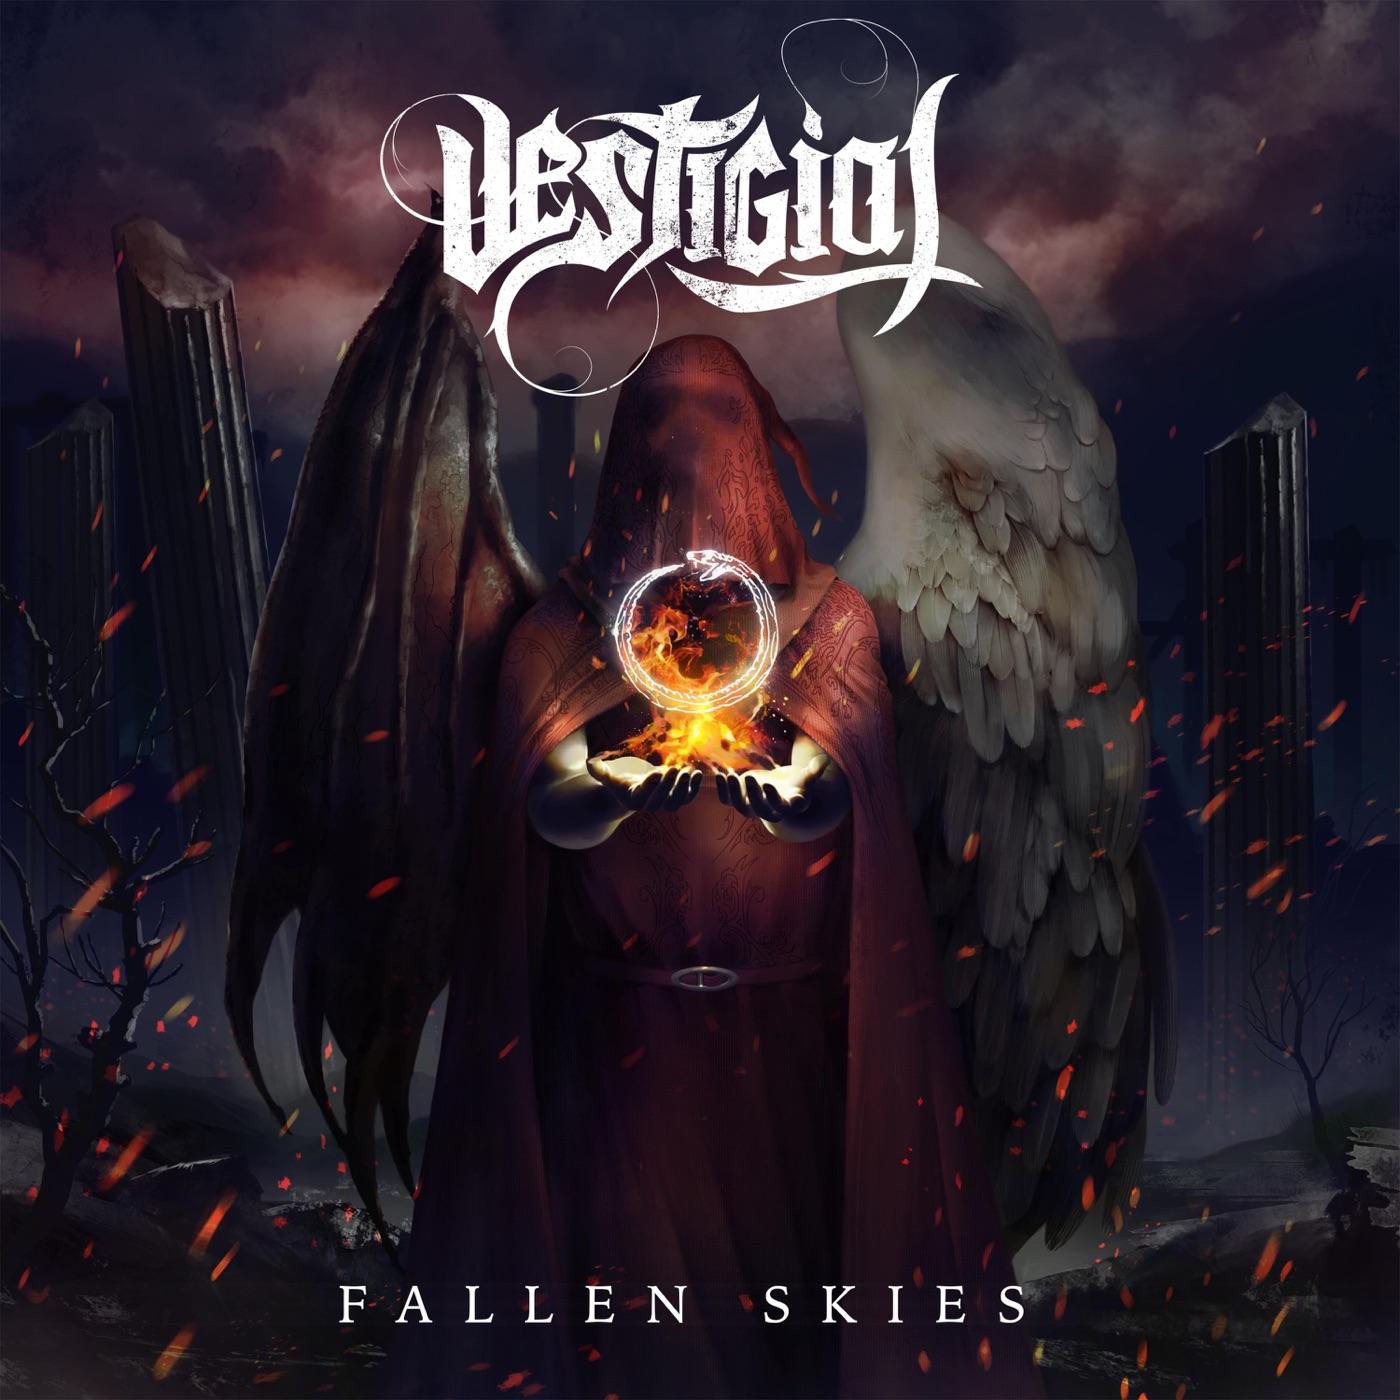 Vestigial - Fallen Skies (2018)